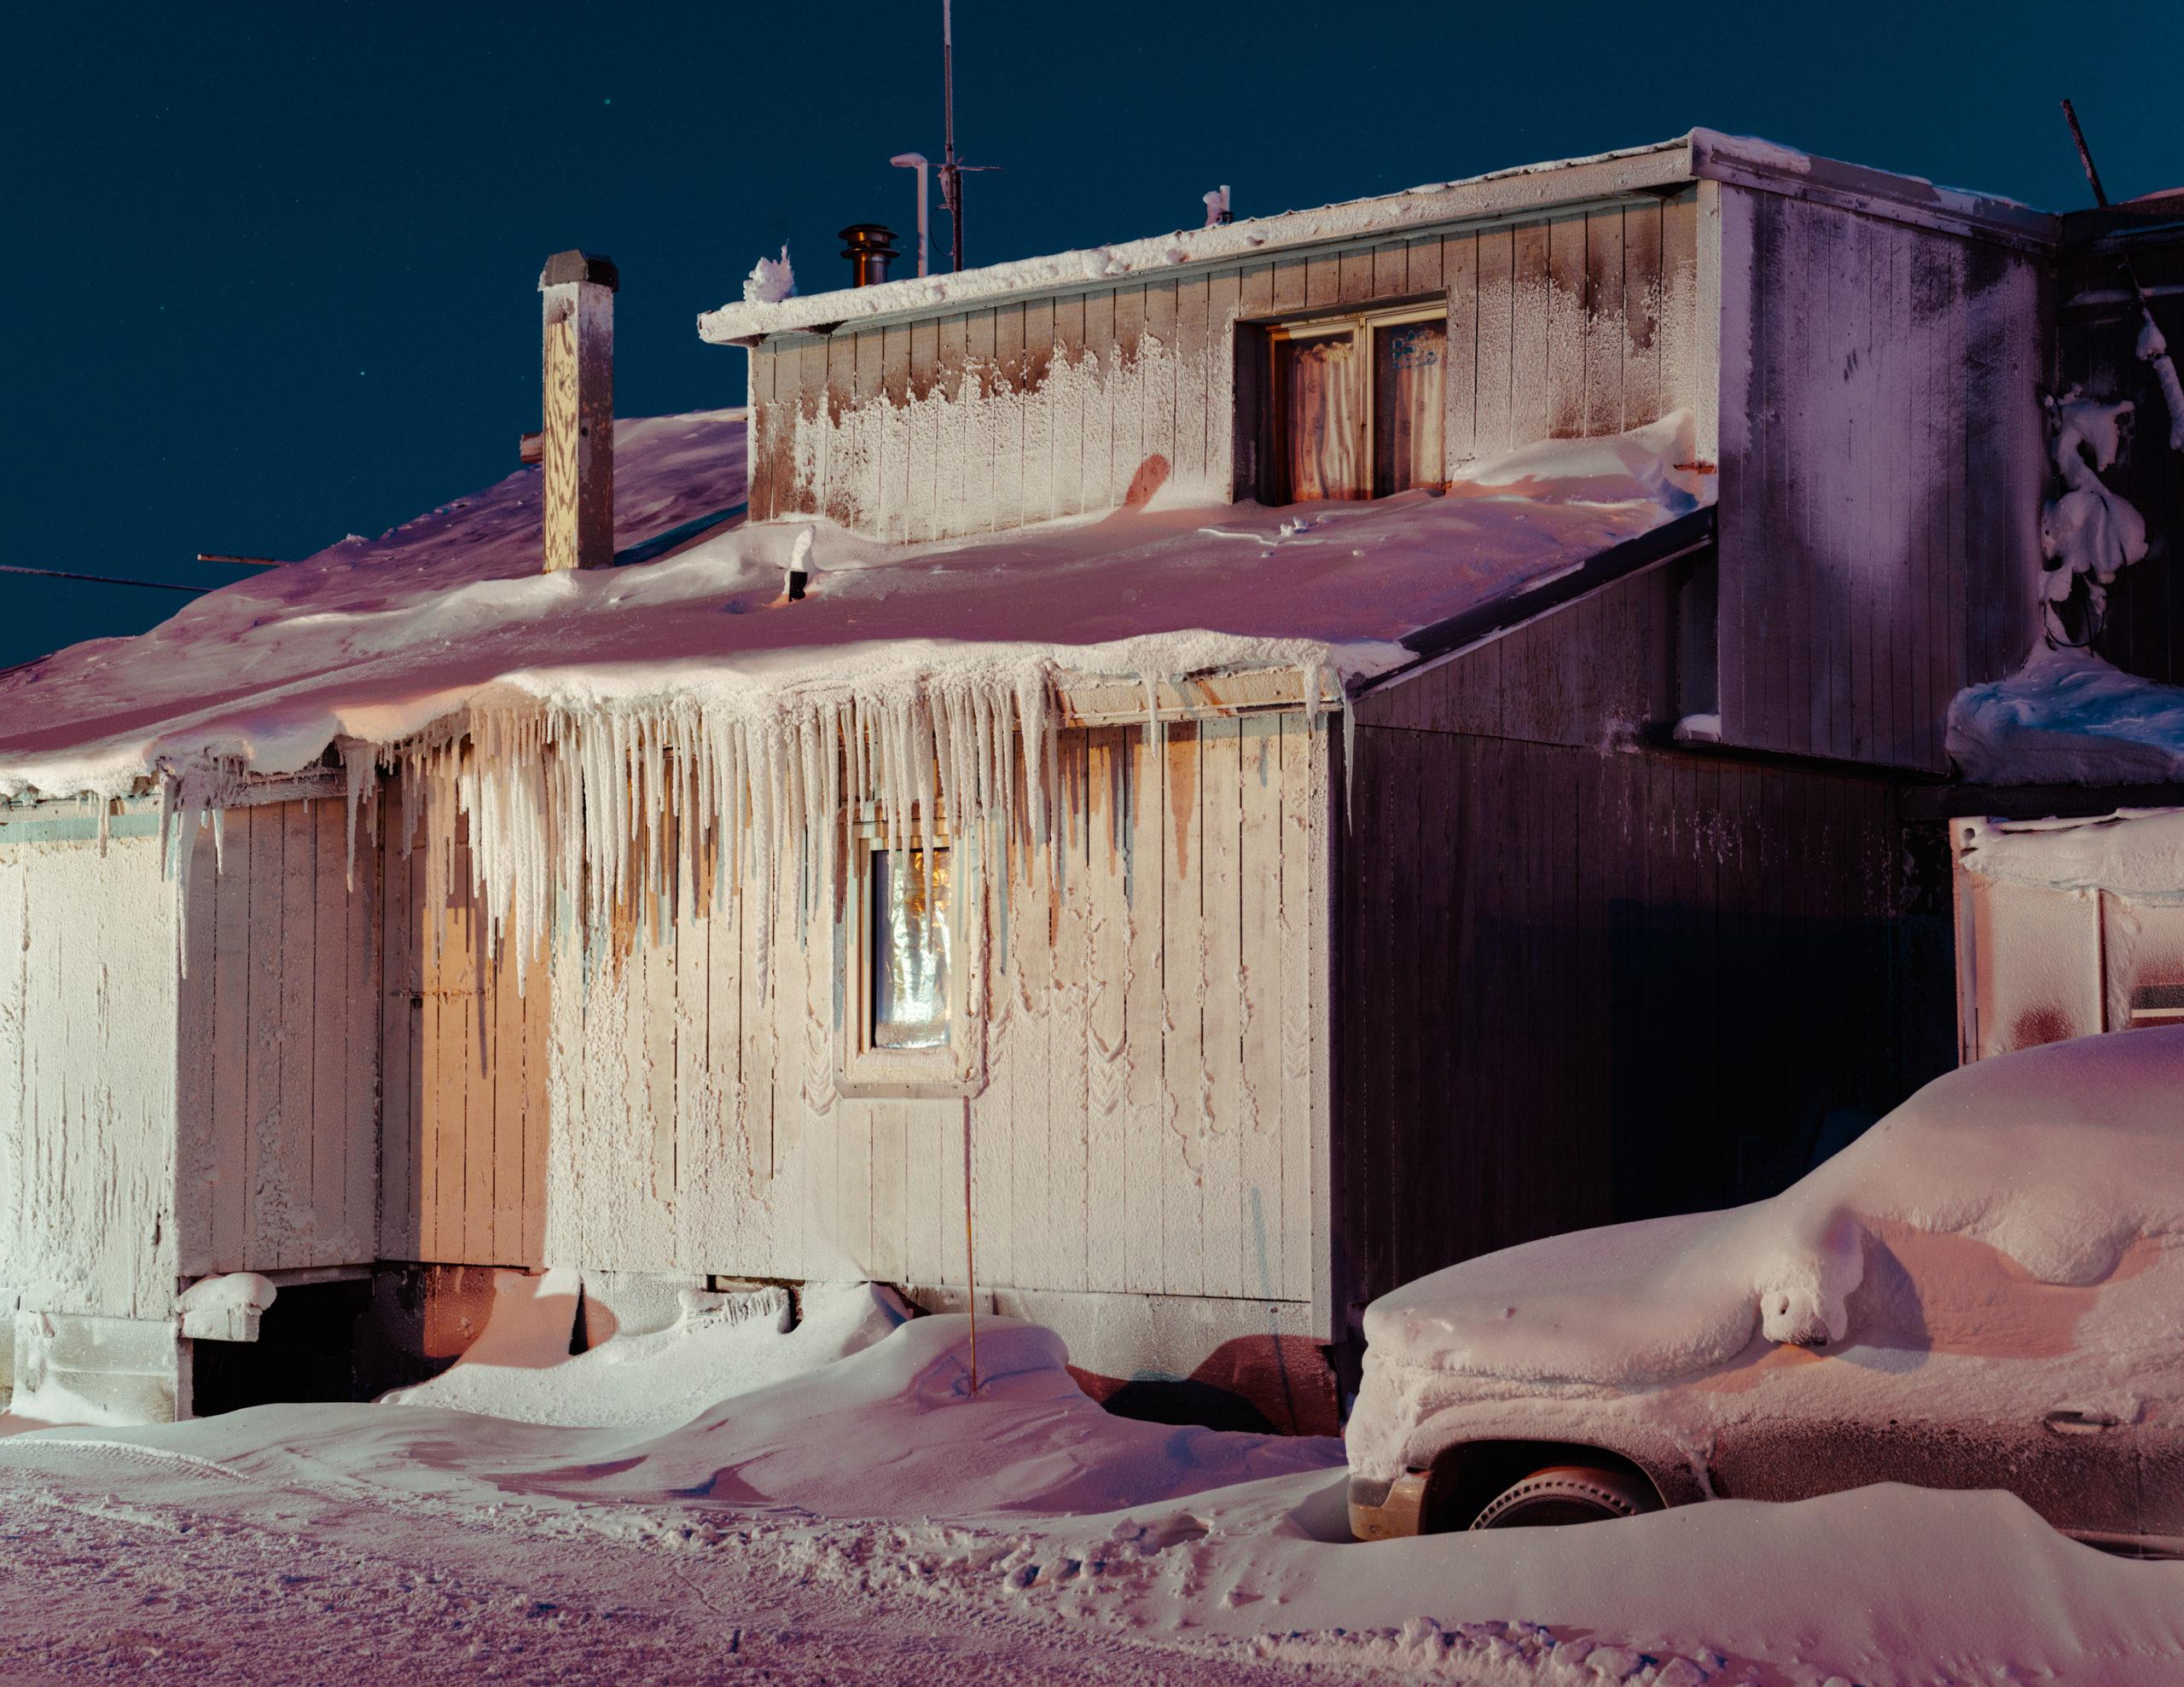 Polar Night: A Visual Poem on an Arctic Town